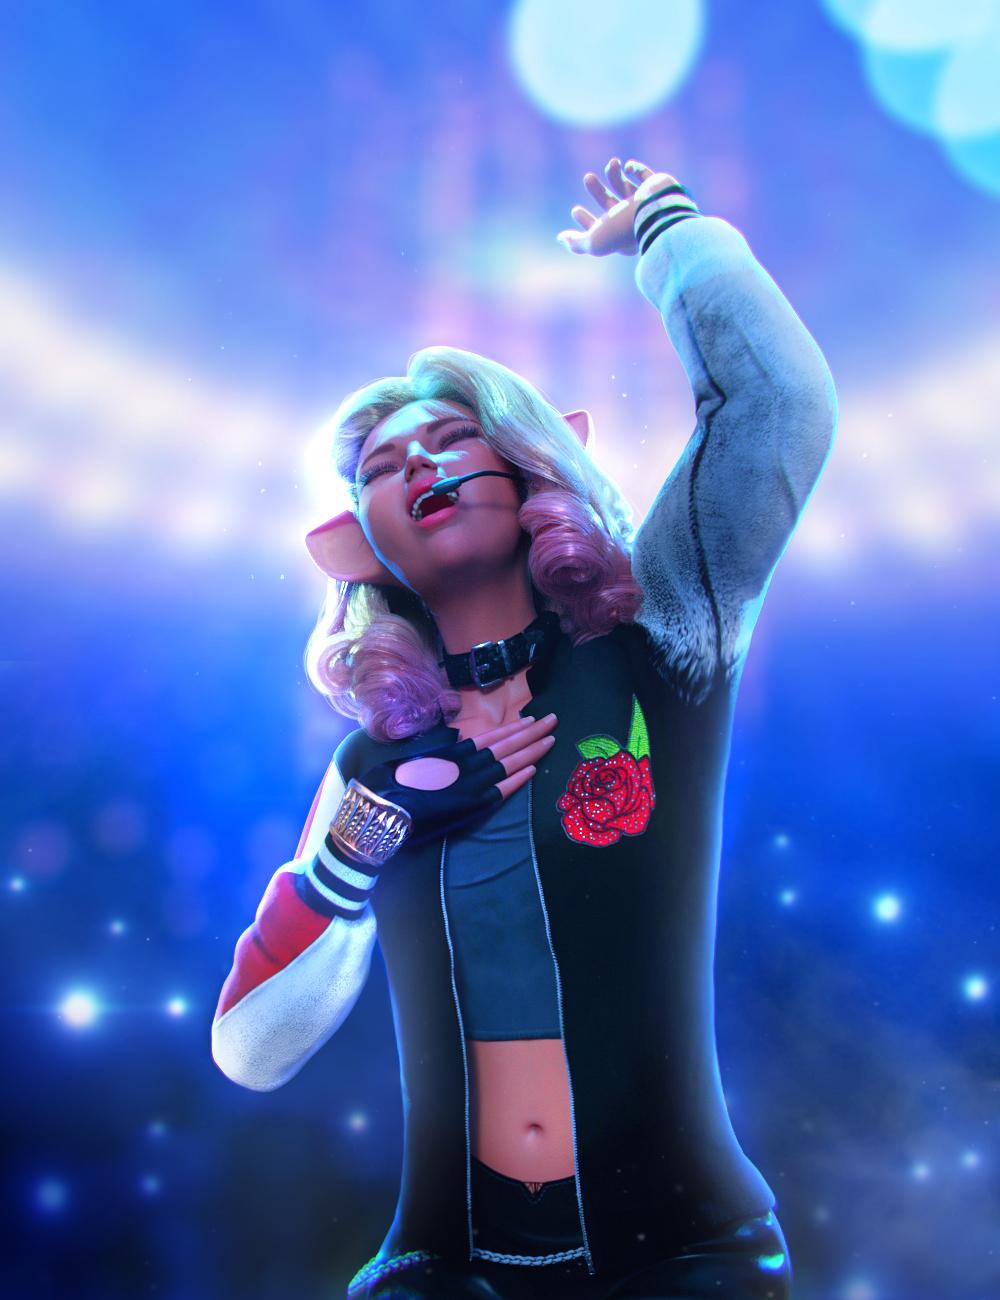 Singing Animations for Genesis 8.1 Female and Kiko 8.1 by: ThreeDigital, 3D Models by Daz 3D